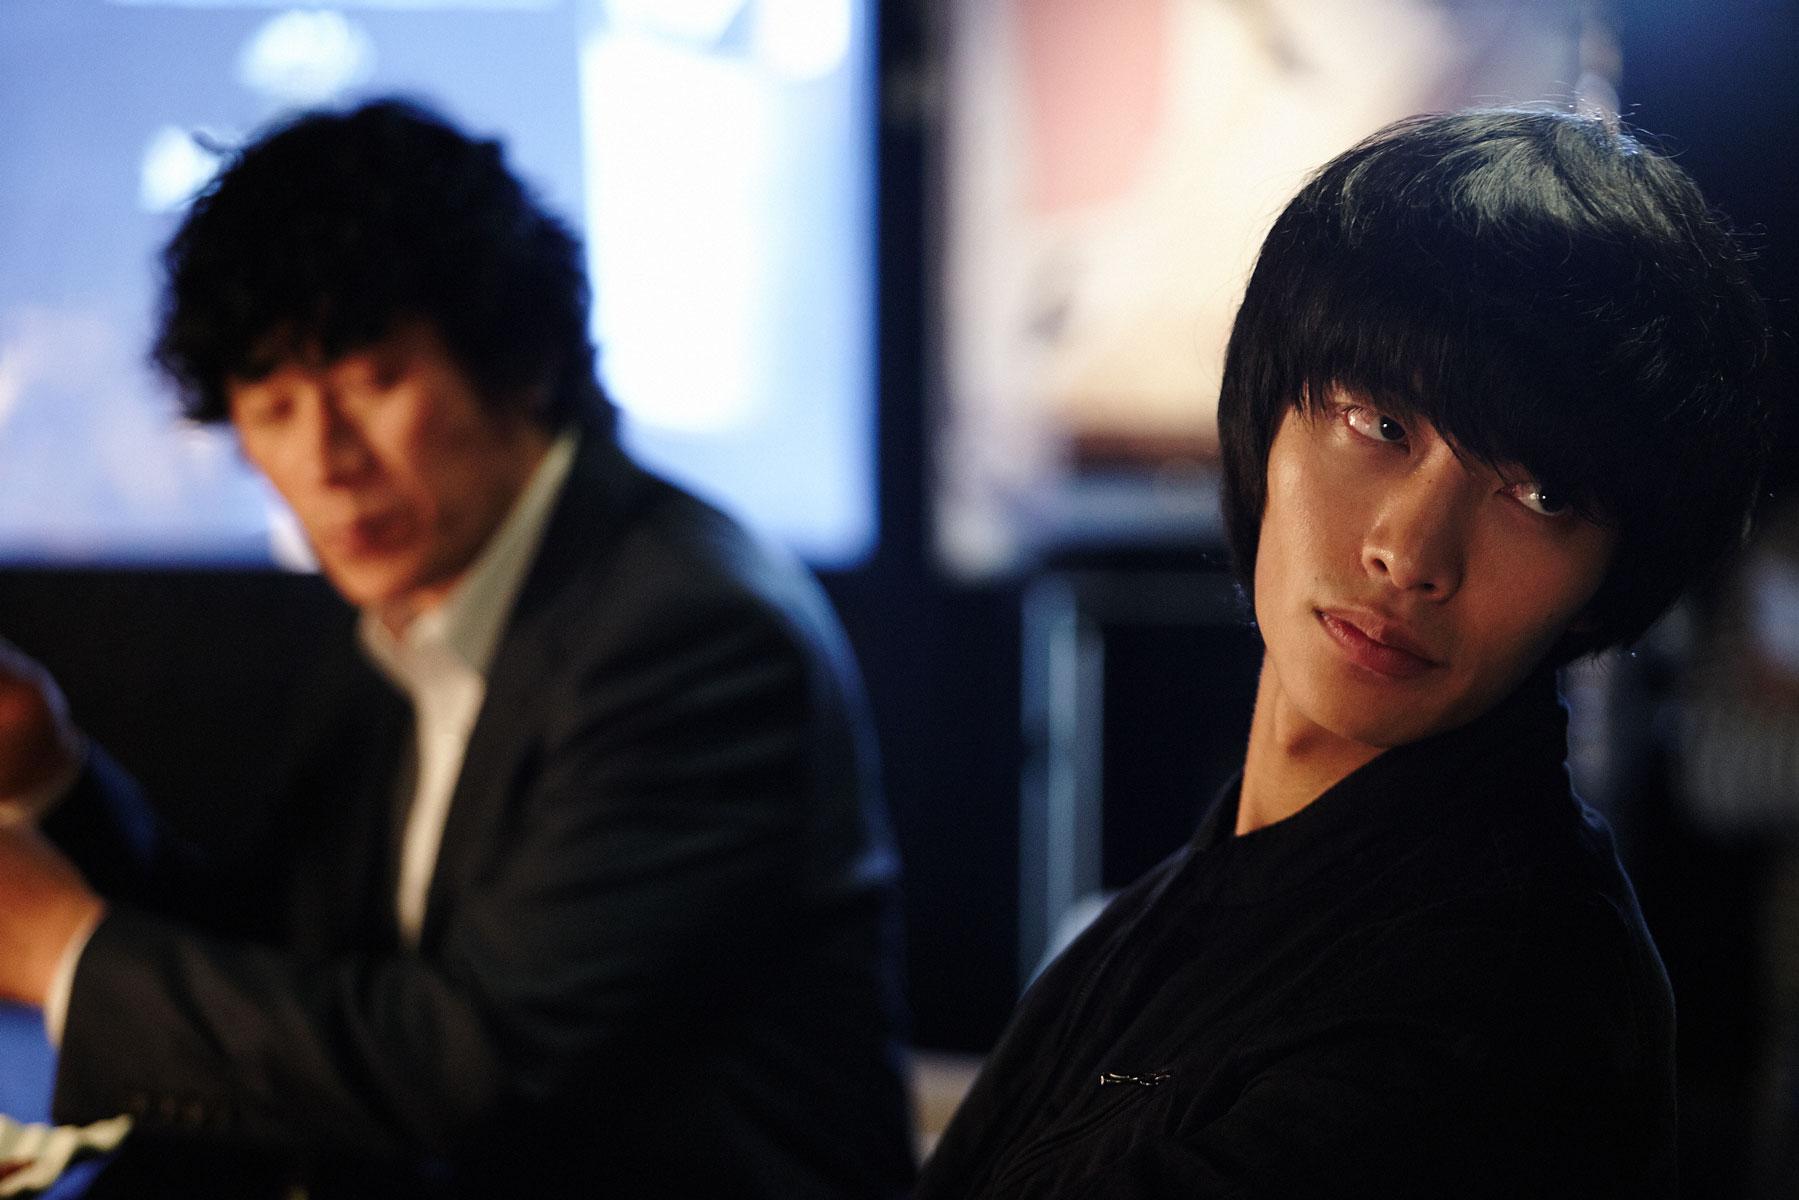 Lee Min Ki and Kim Roi Ha as the two brothers Tae Soo and Ik Sang.